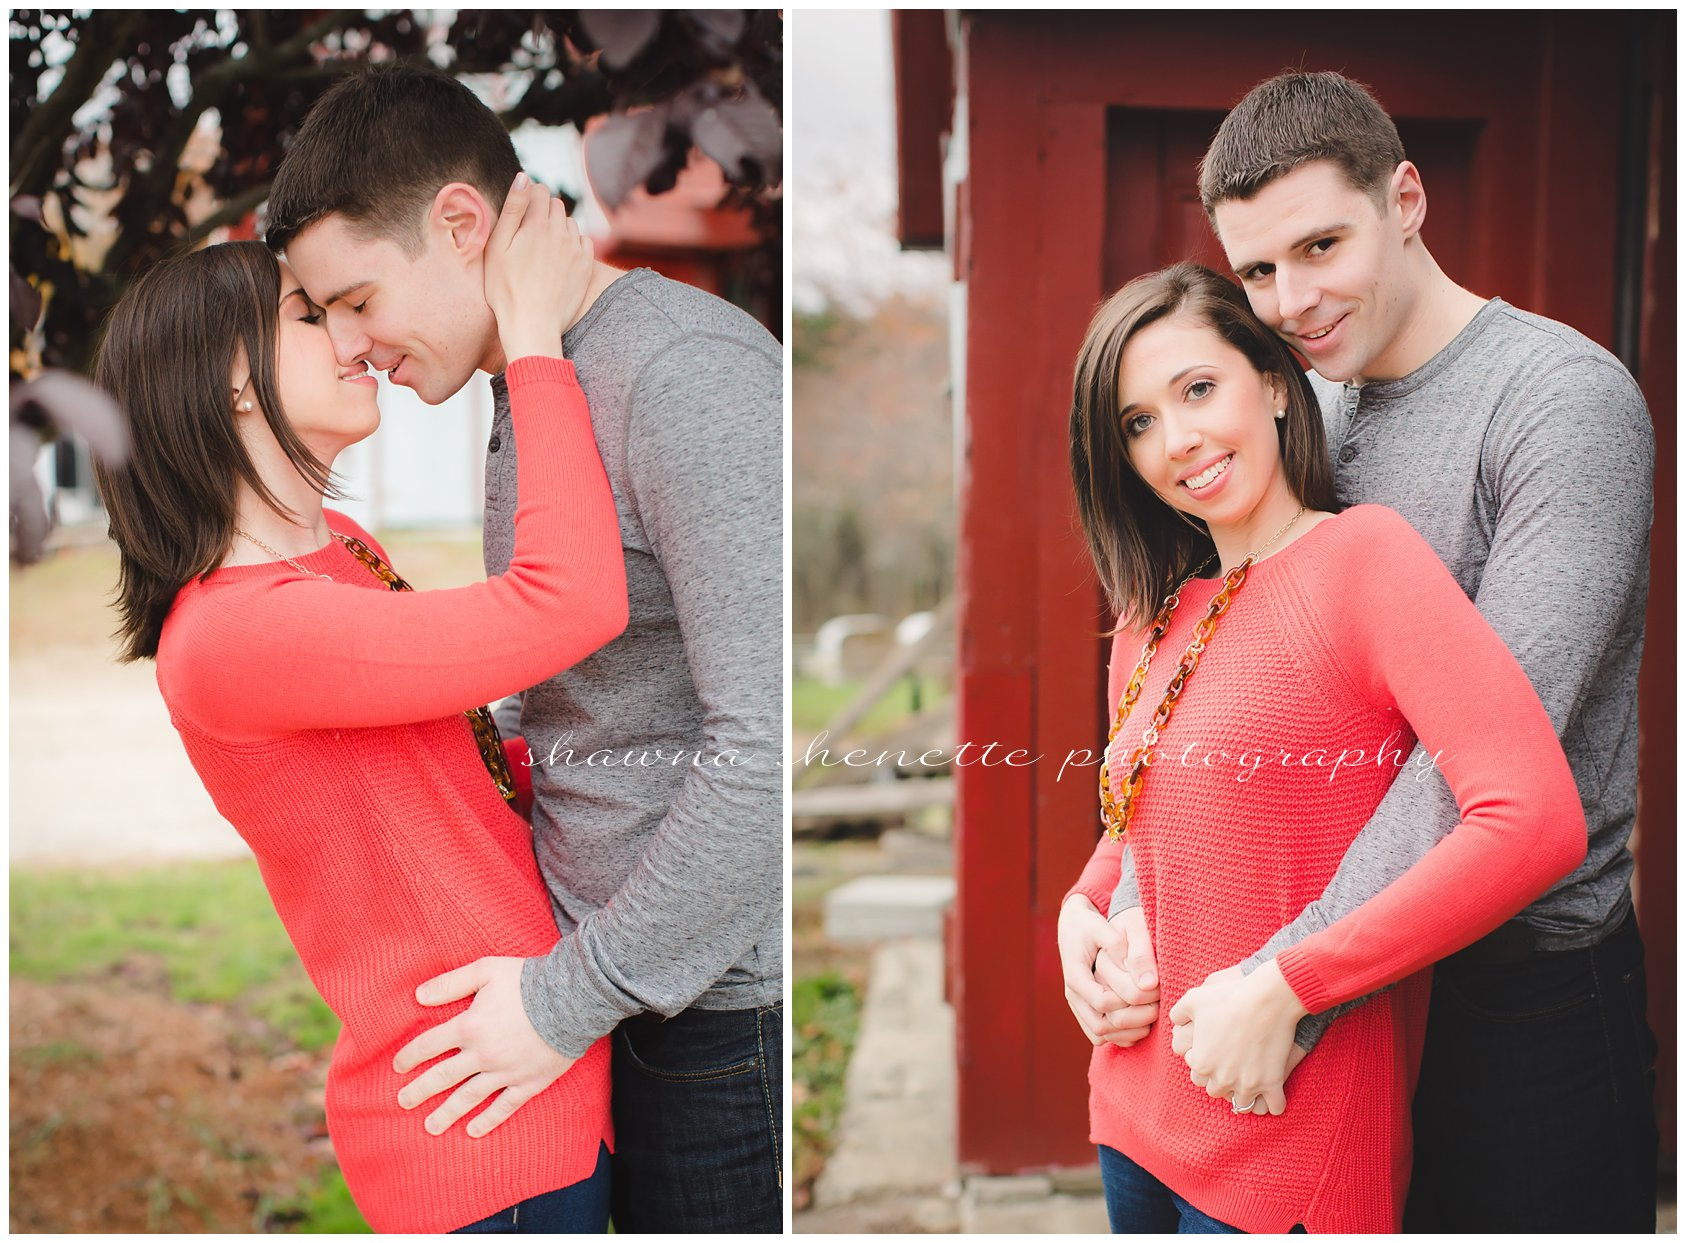 massachusetts best wedding engagement photographer worcester central mass boston rhode island shrewsbury